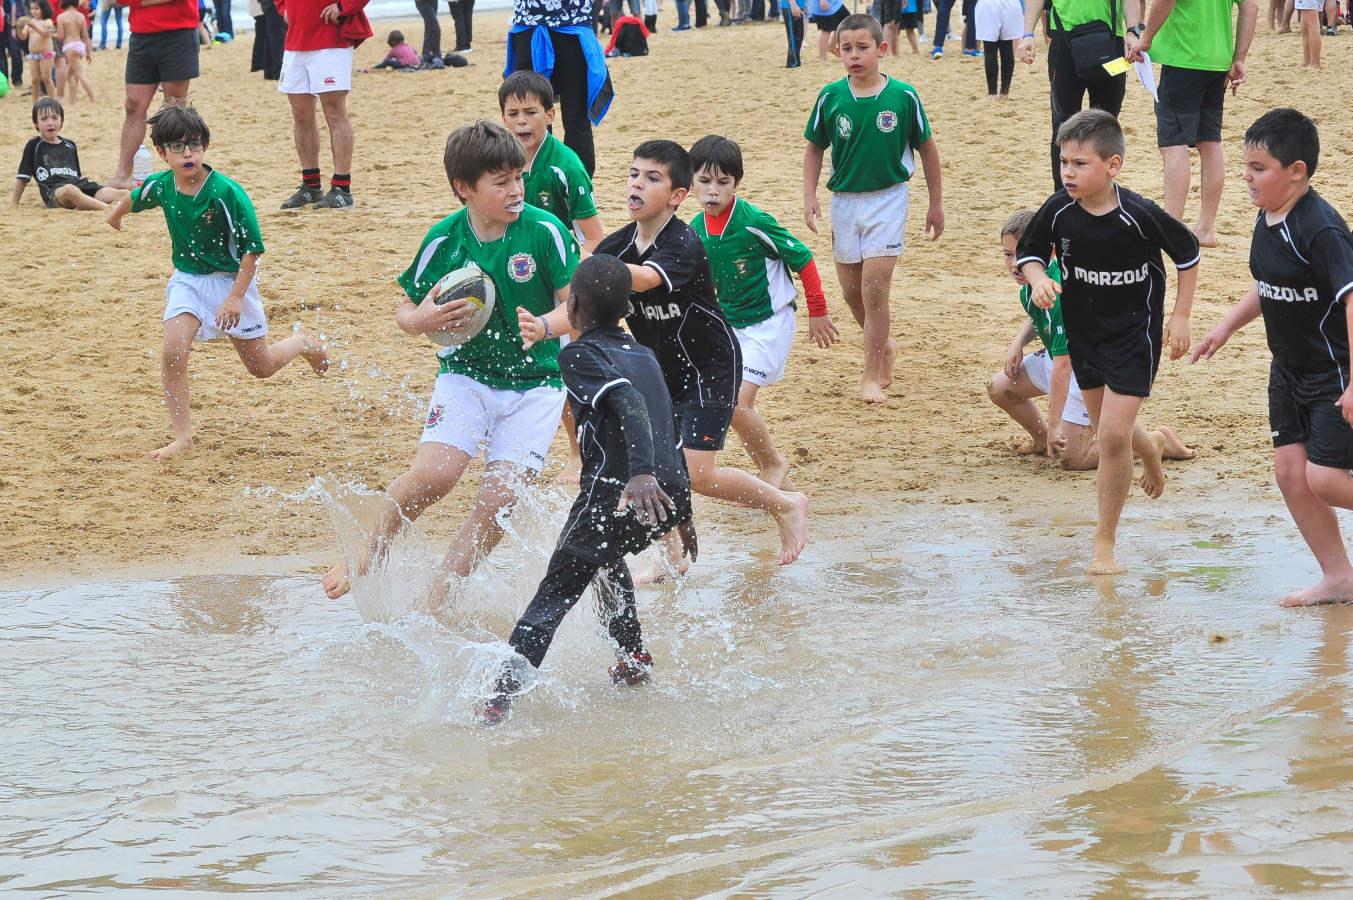 El rugby infantil se juega en la playa